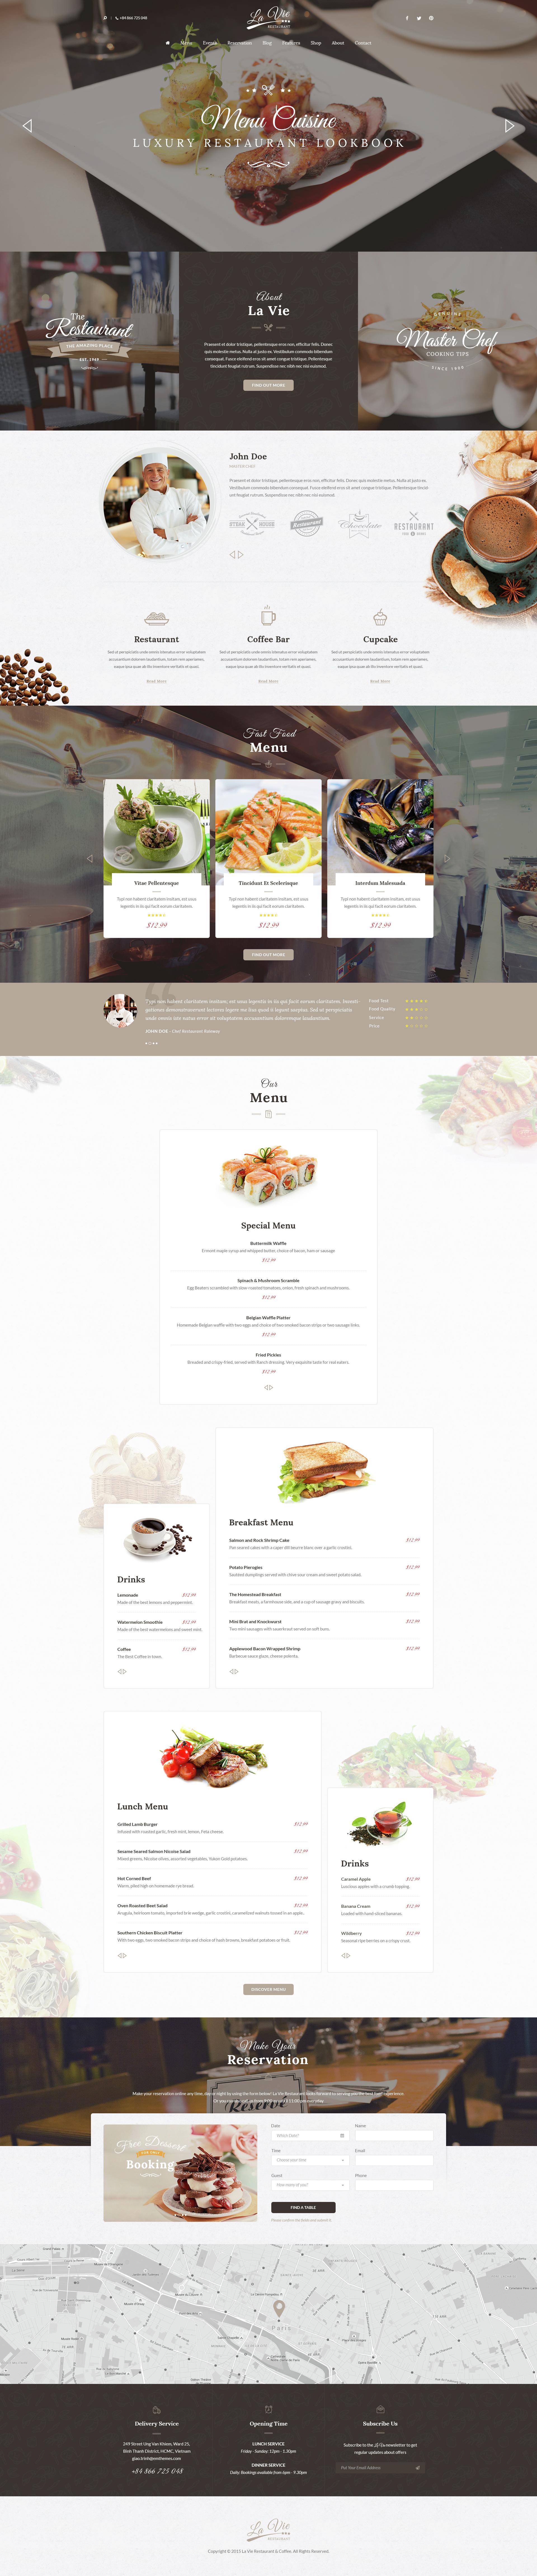 Lavie Restaurant Bar Cafe Responsive Wordpress Theme By Kalathemes